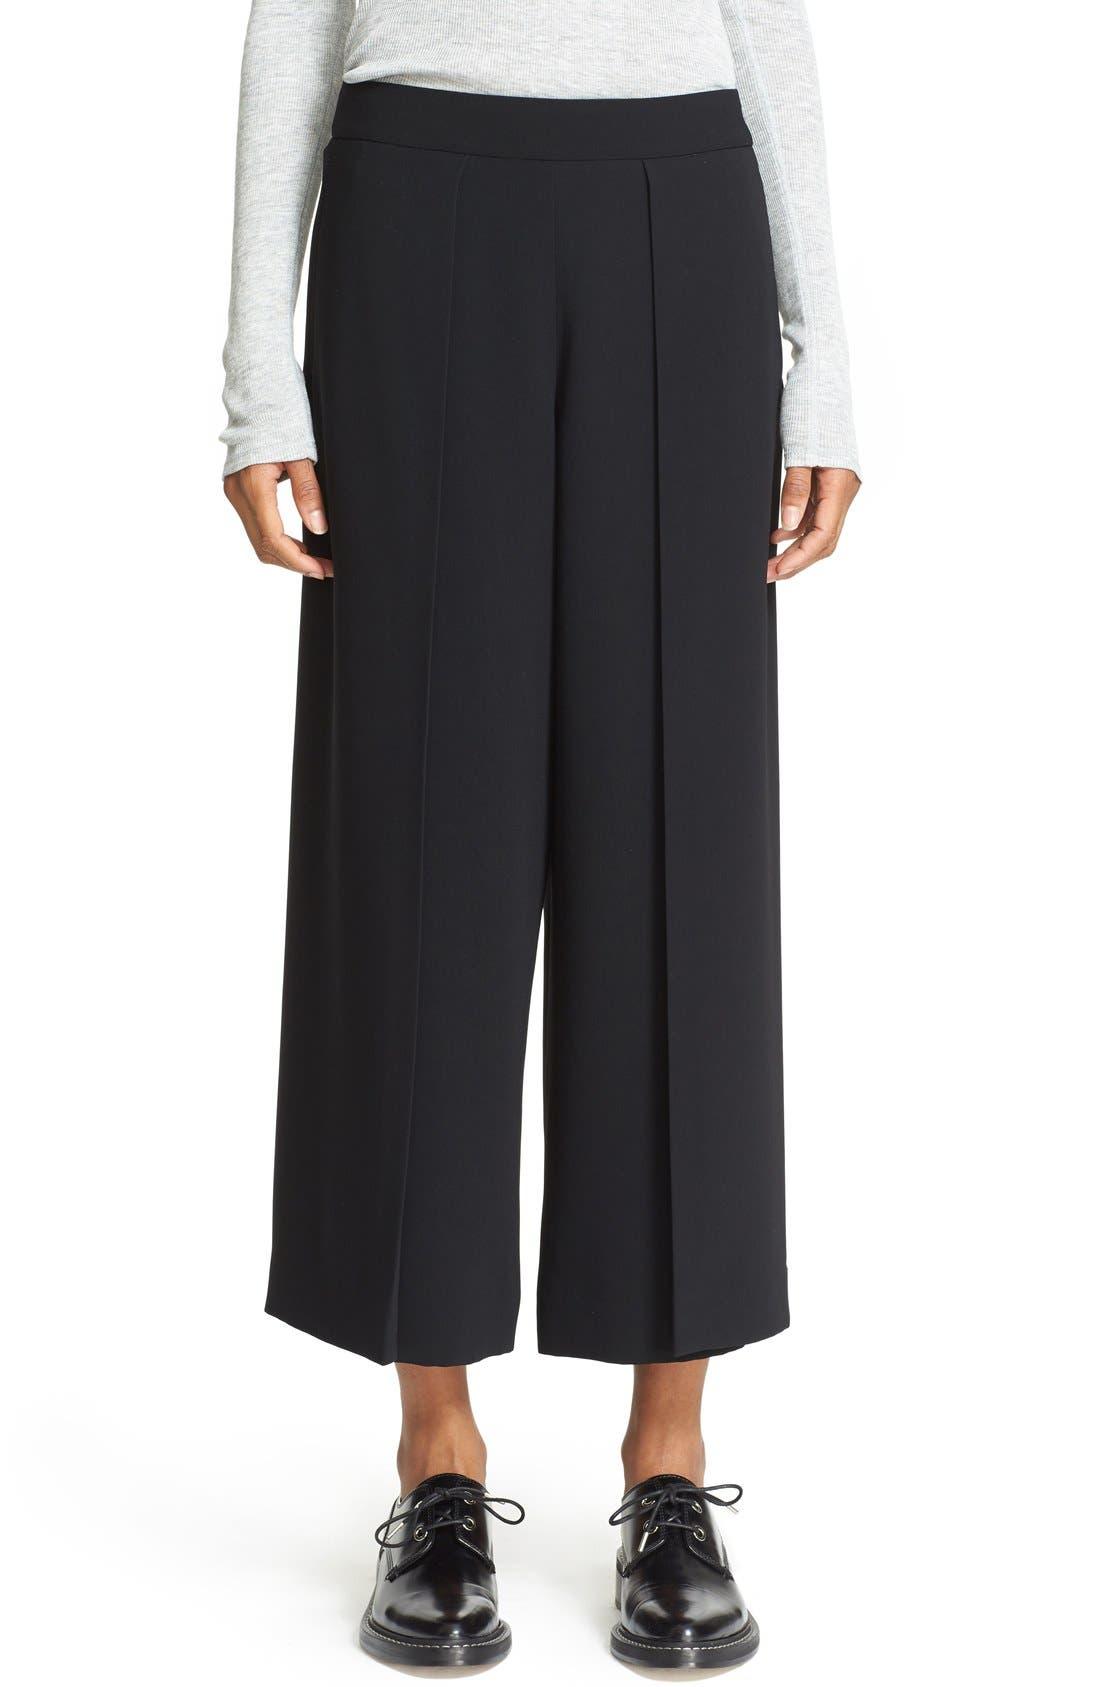 'Rowe' Pleat Crop Pants,                         Main,                         color, Black